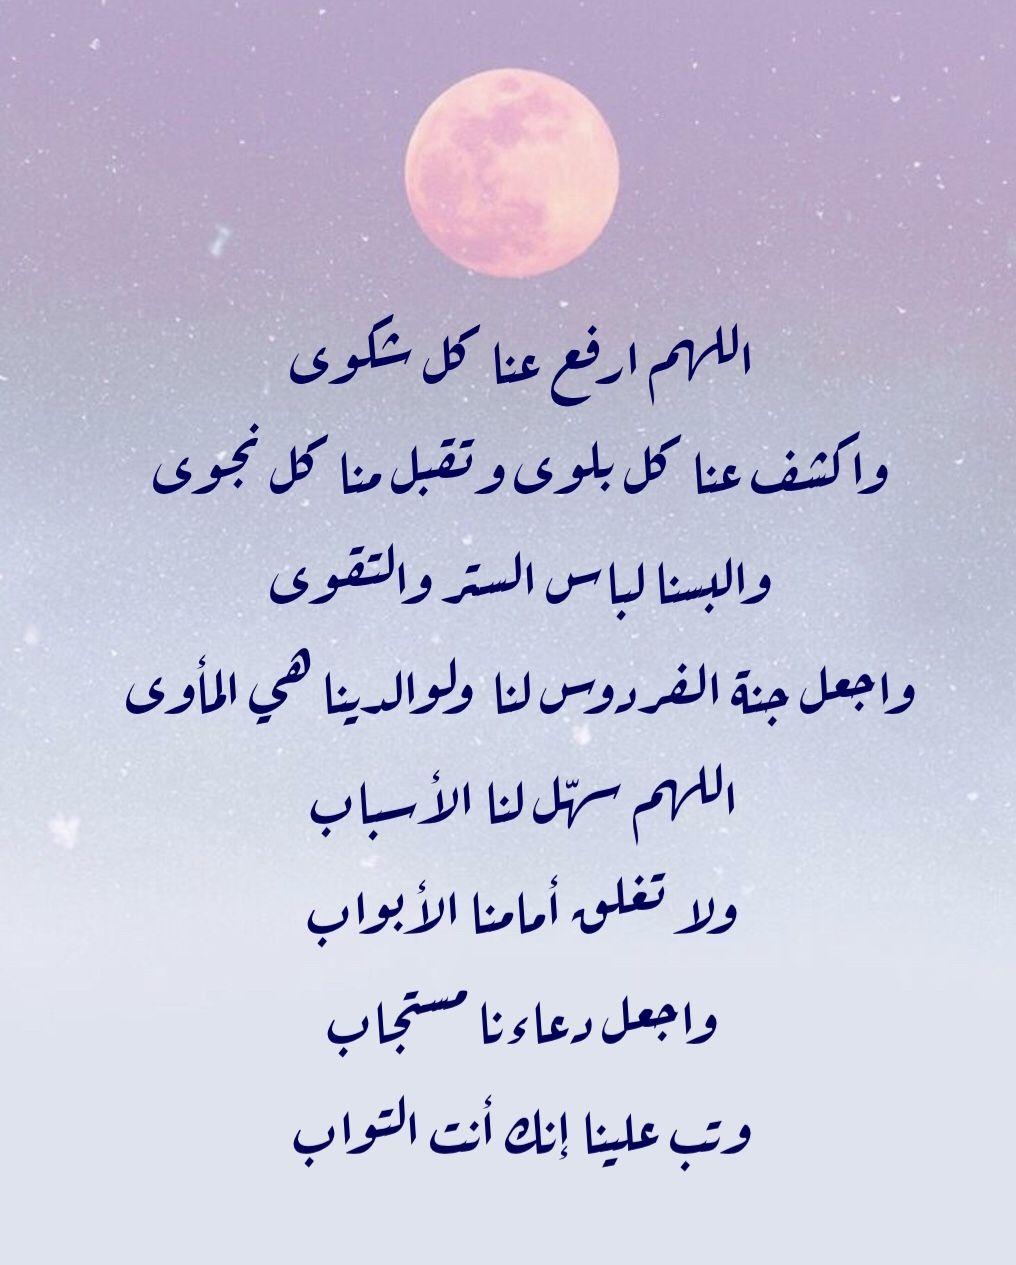 Pin By Nourhanhussin On دعاء Spiritual Beliefs Arabic Quotes Beliefs